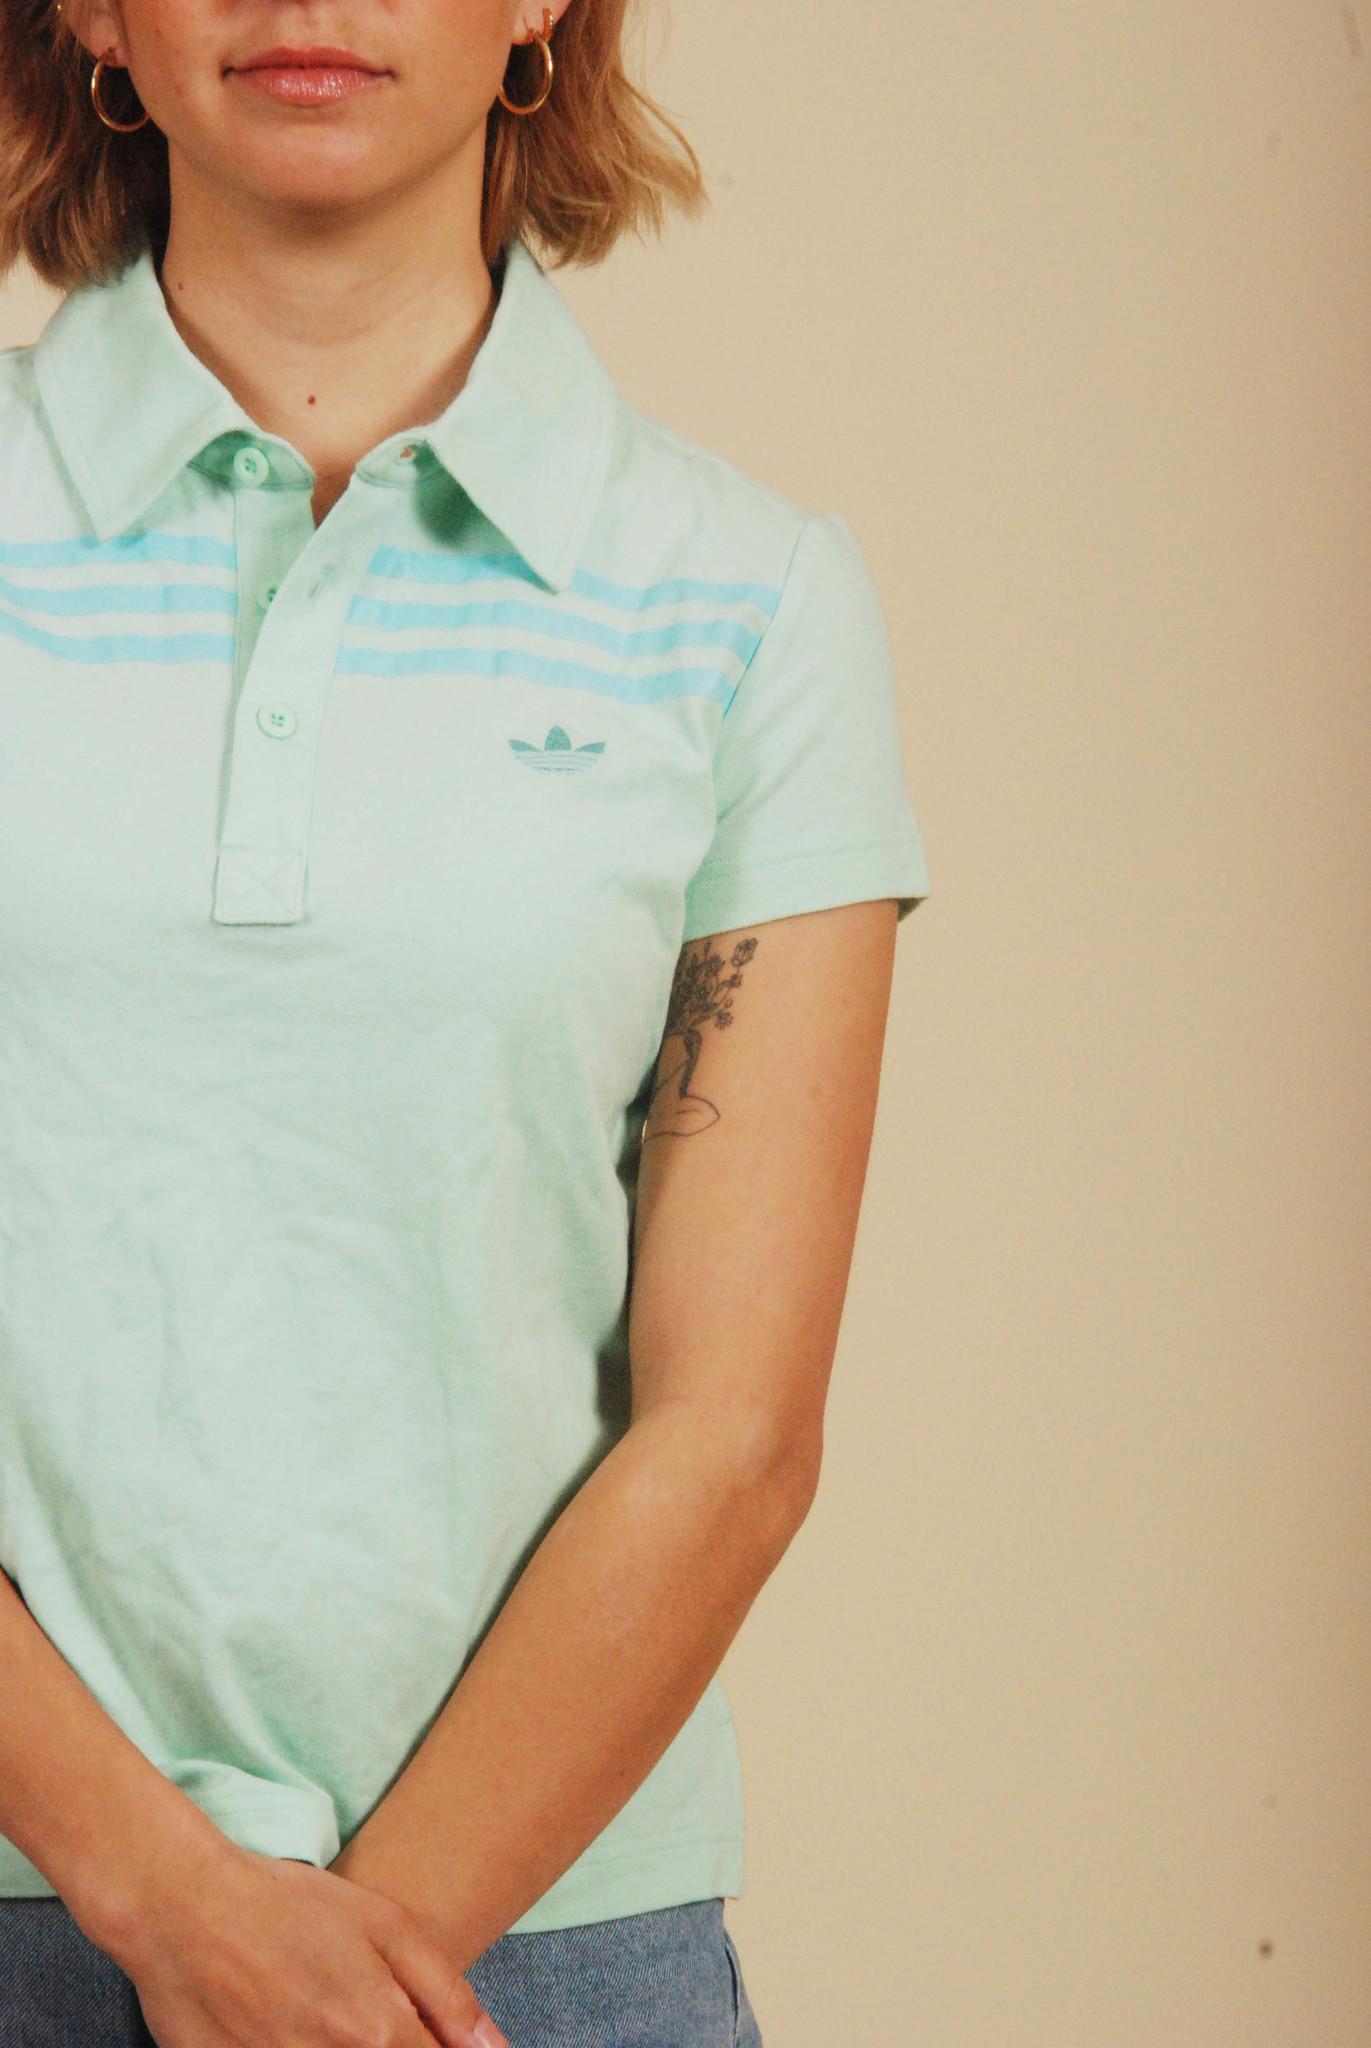 Green 90s Adidas polo shirt